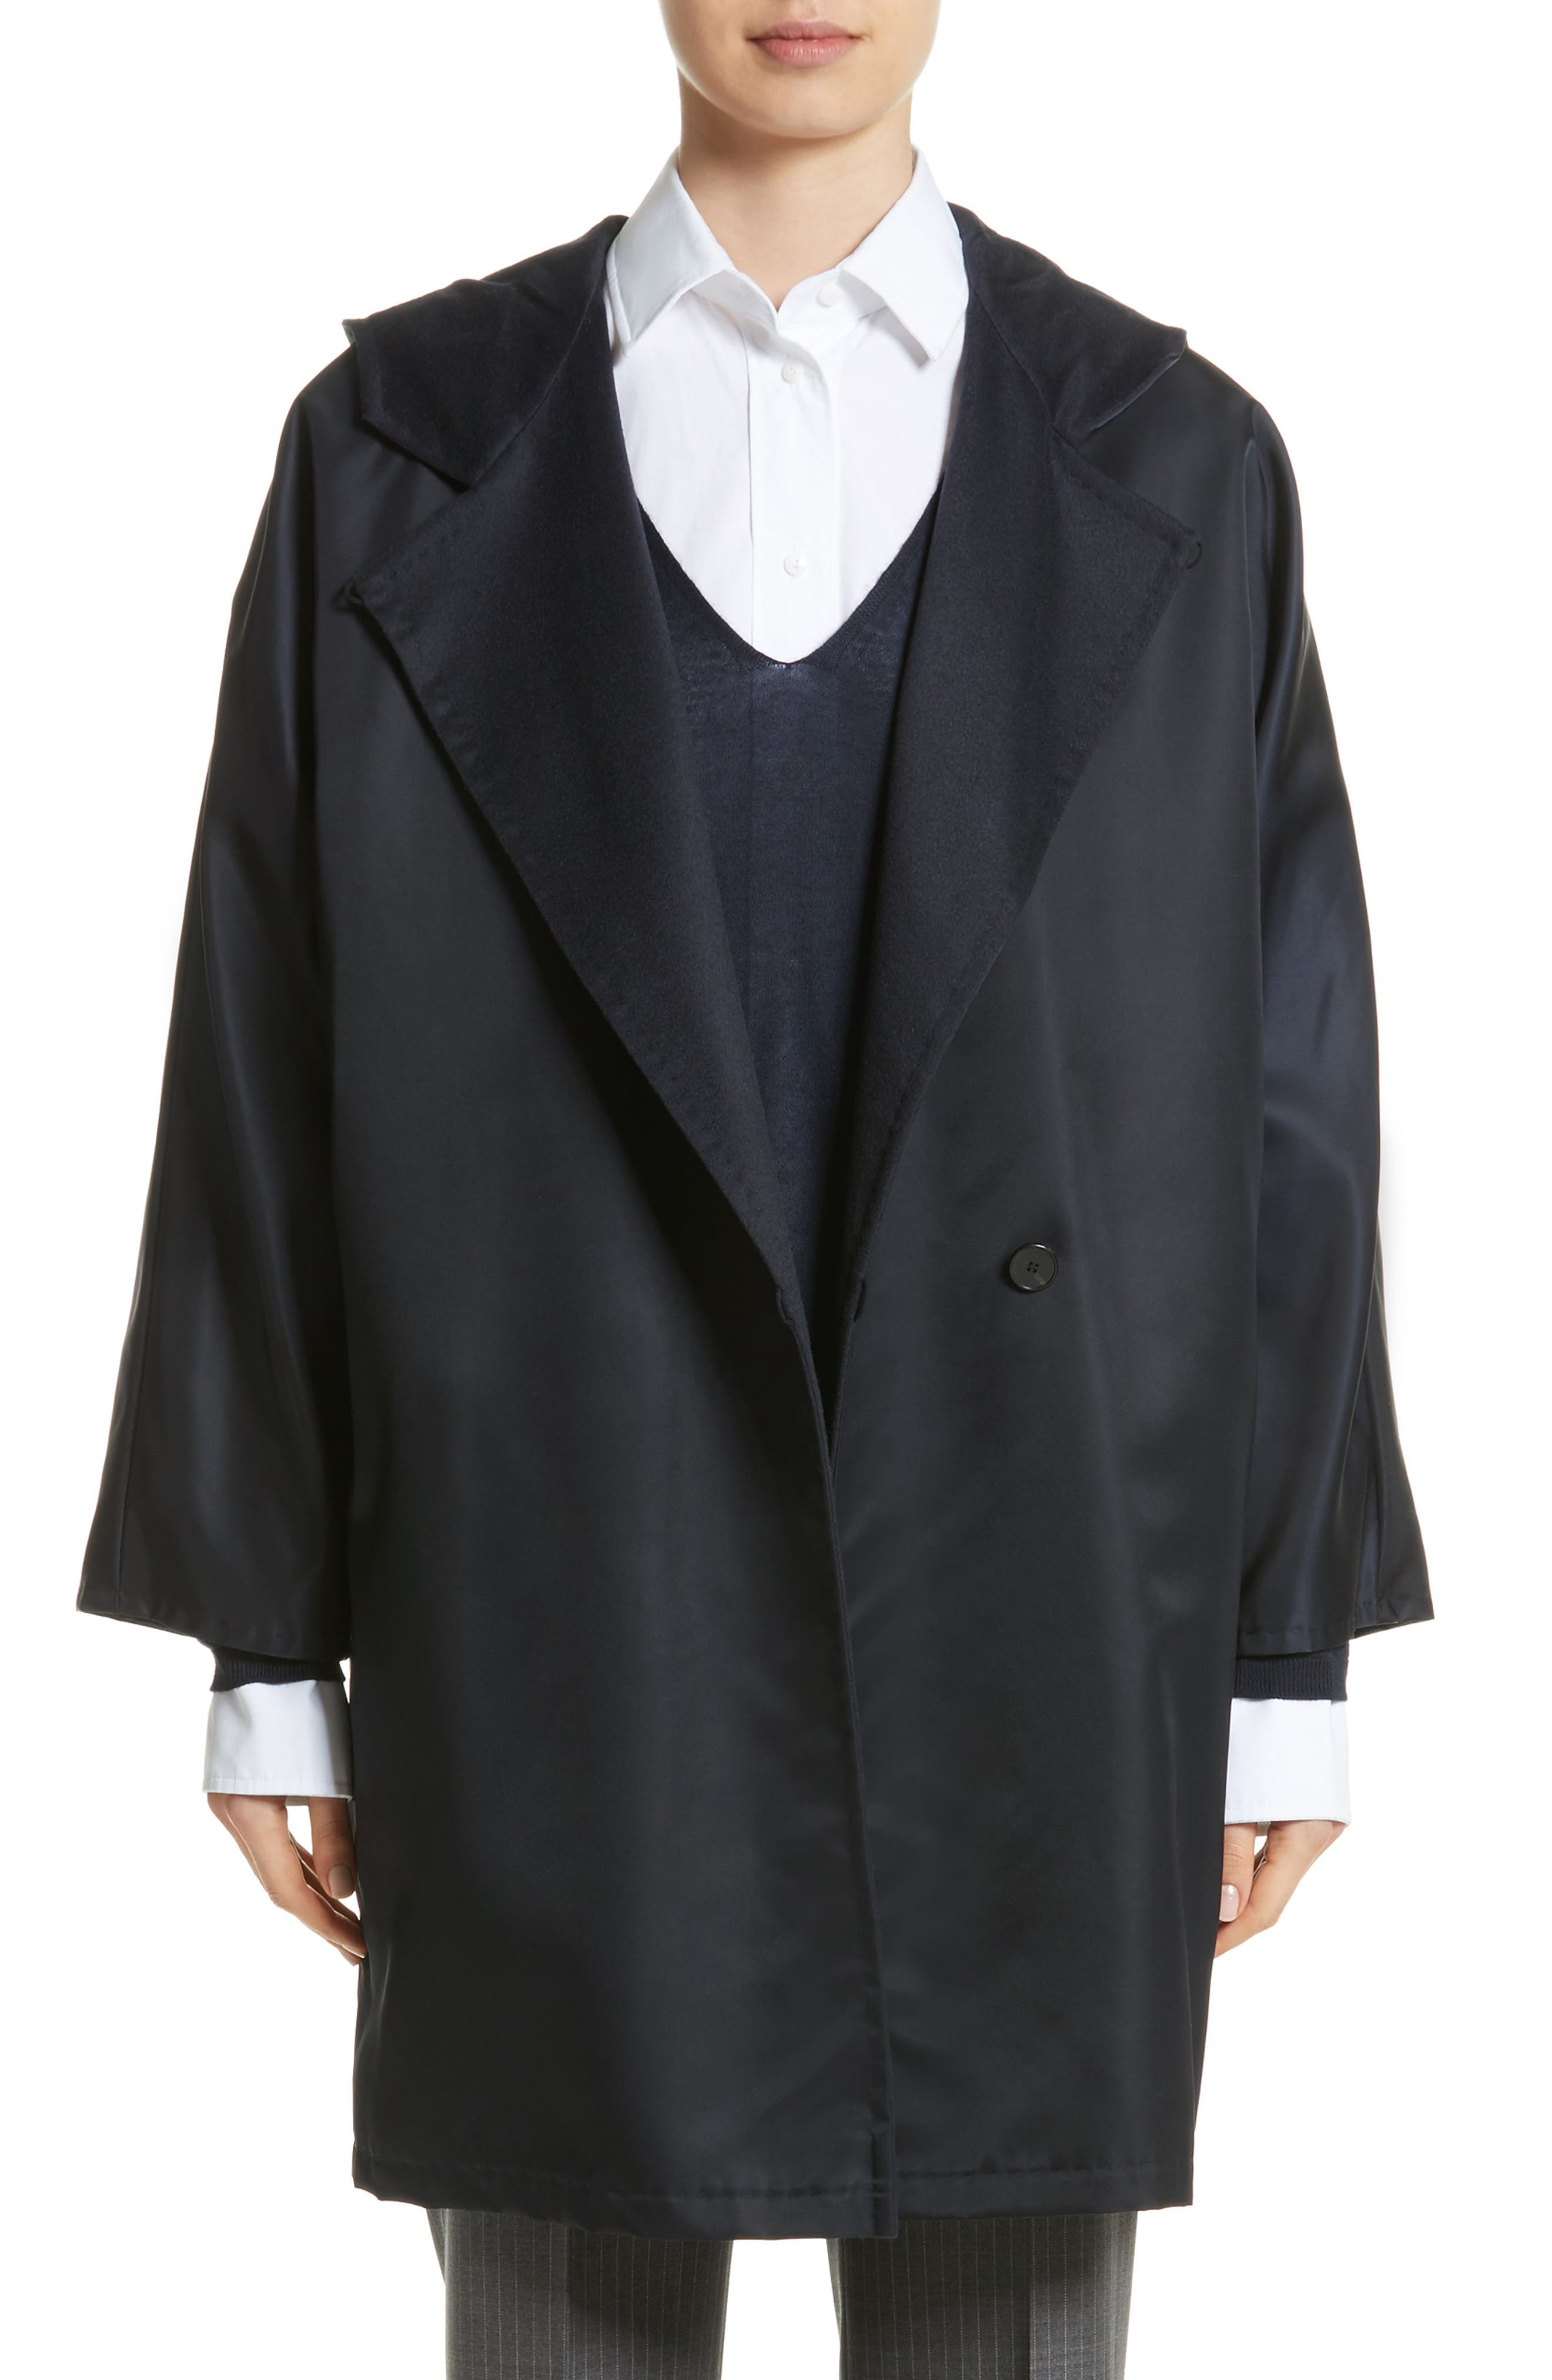 Jacopo Reversible Hooded Coat,                             Main thumbnail 1, color,                             411